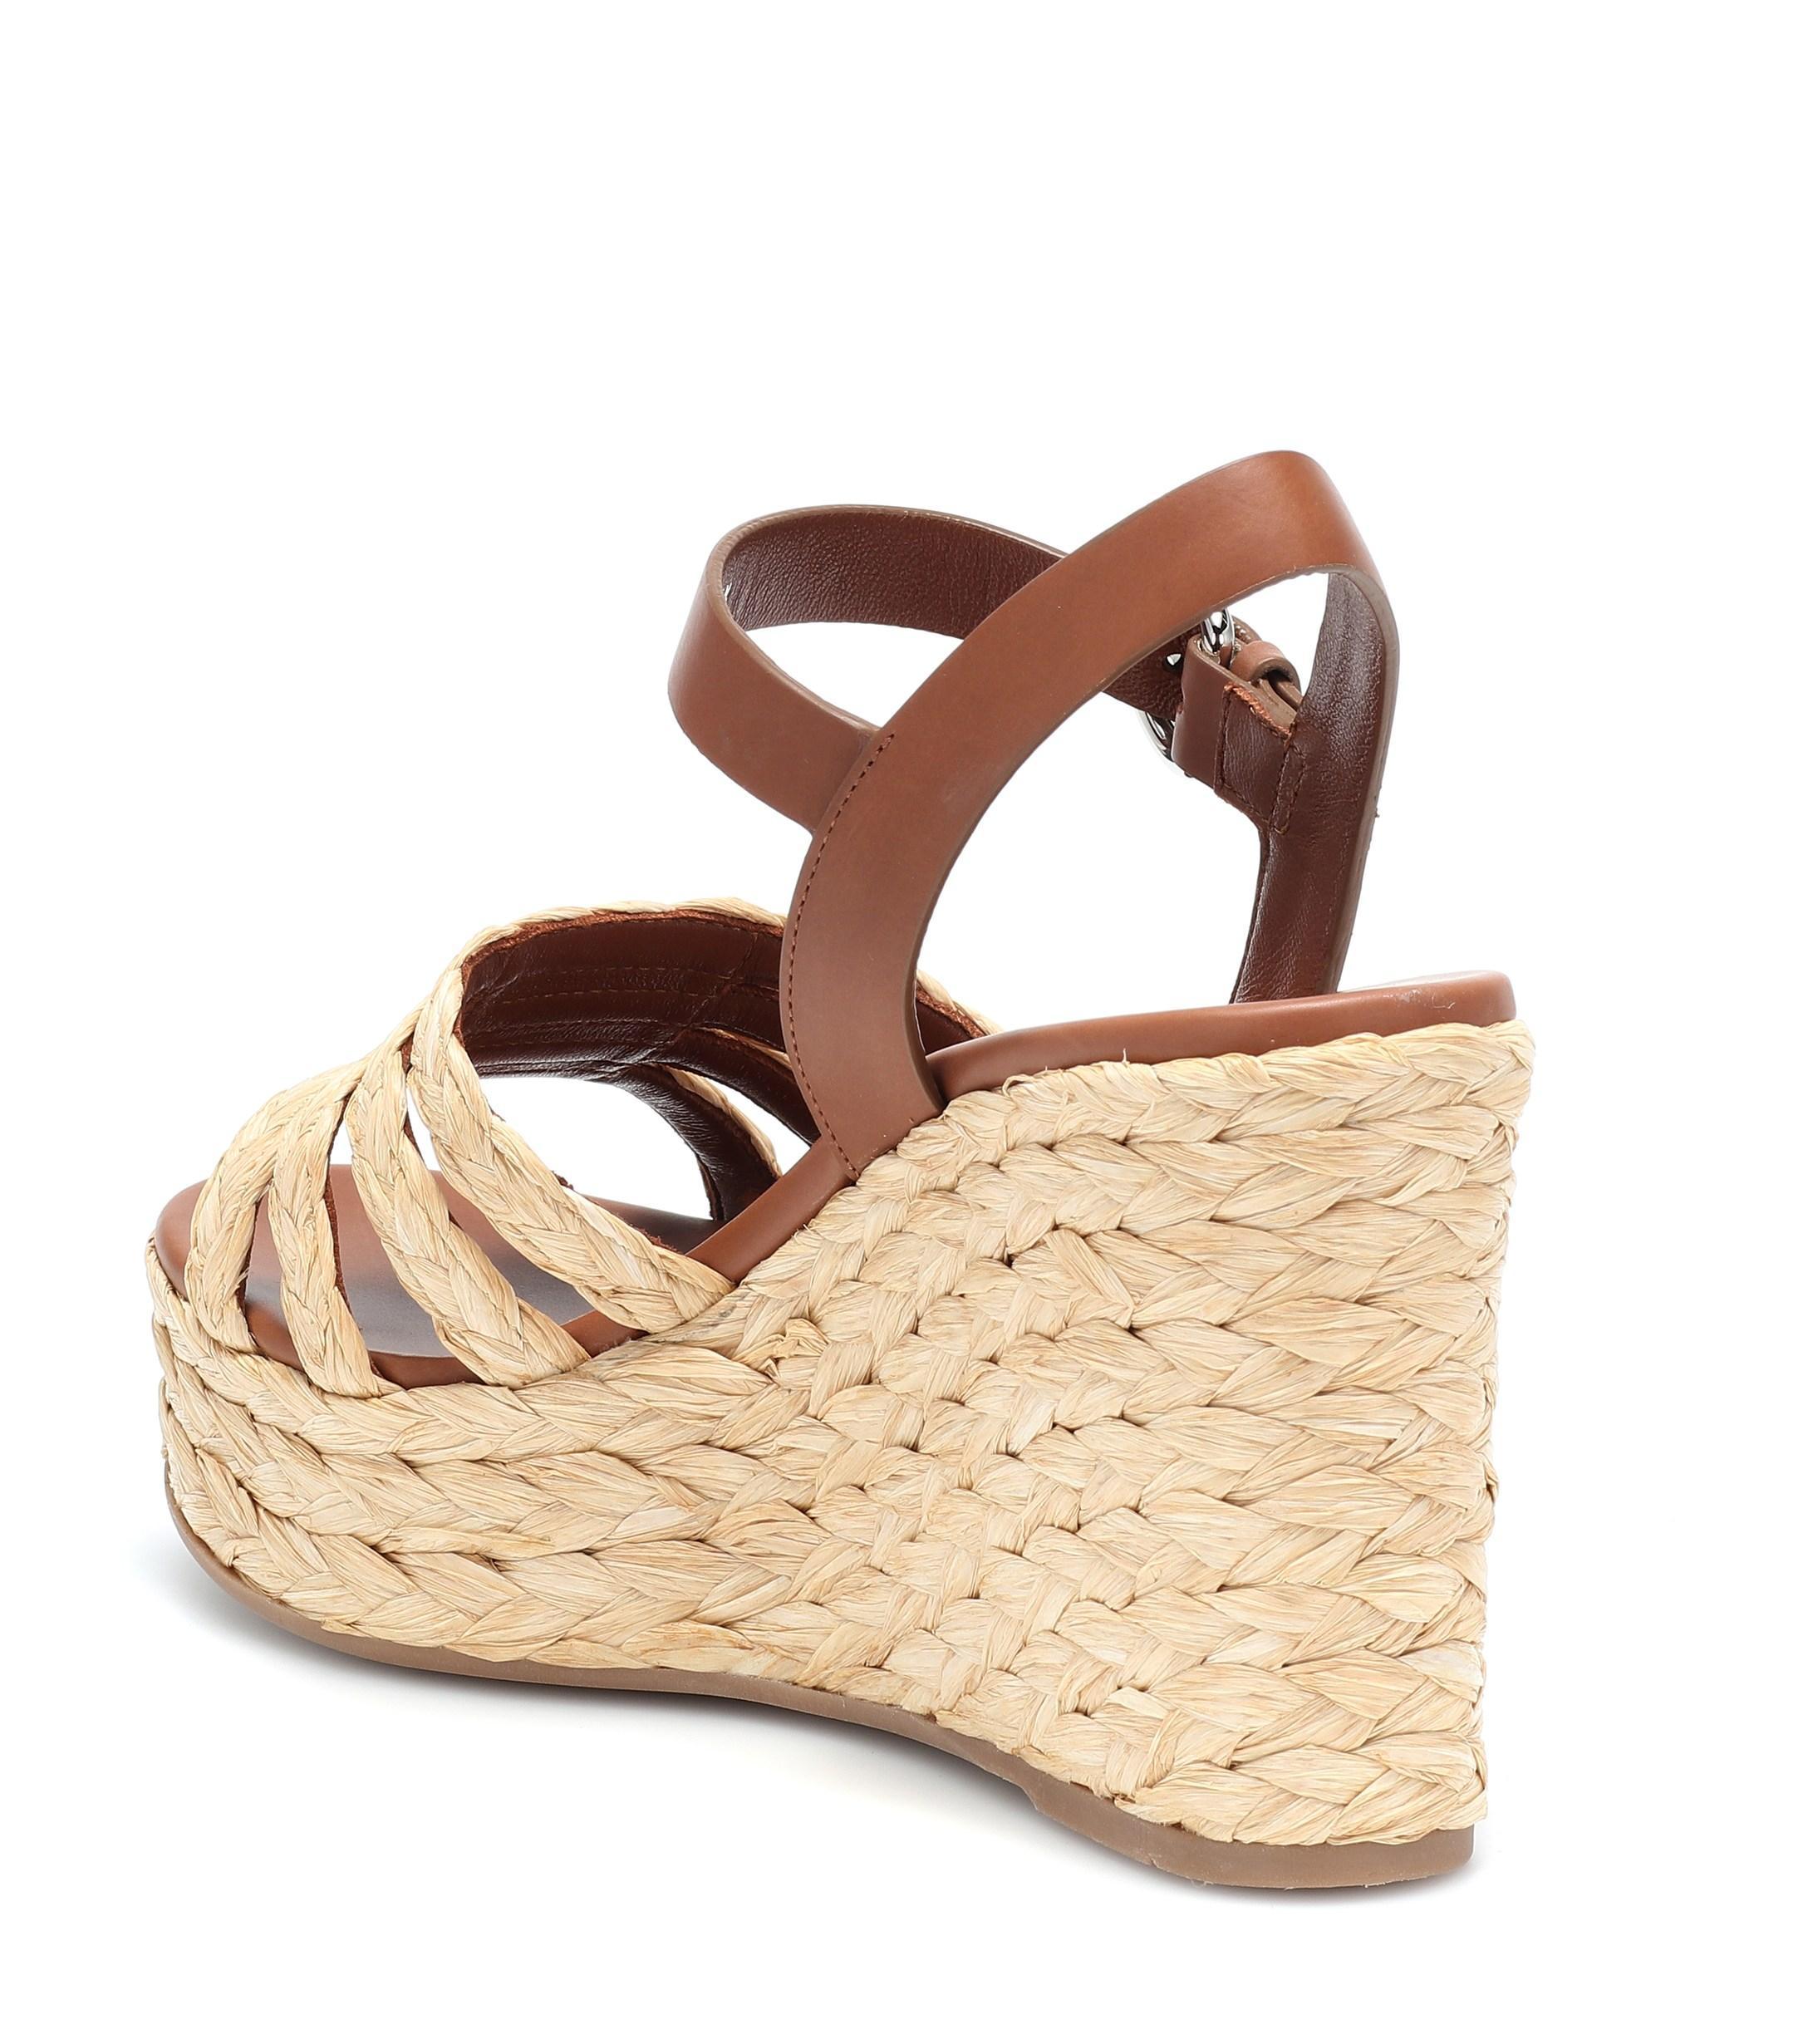 b74cac478e7 Women's Espadrille Wedge Sandal